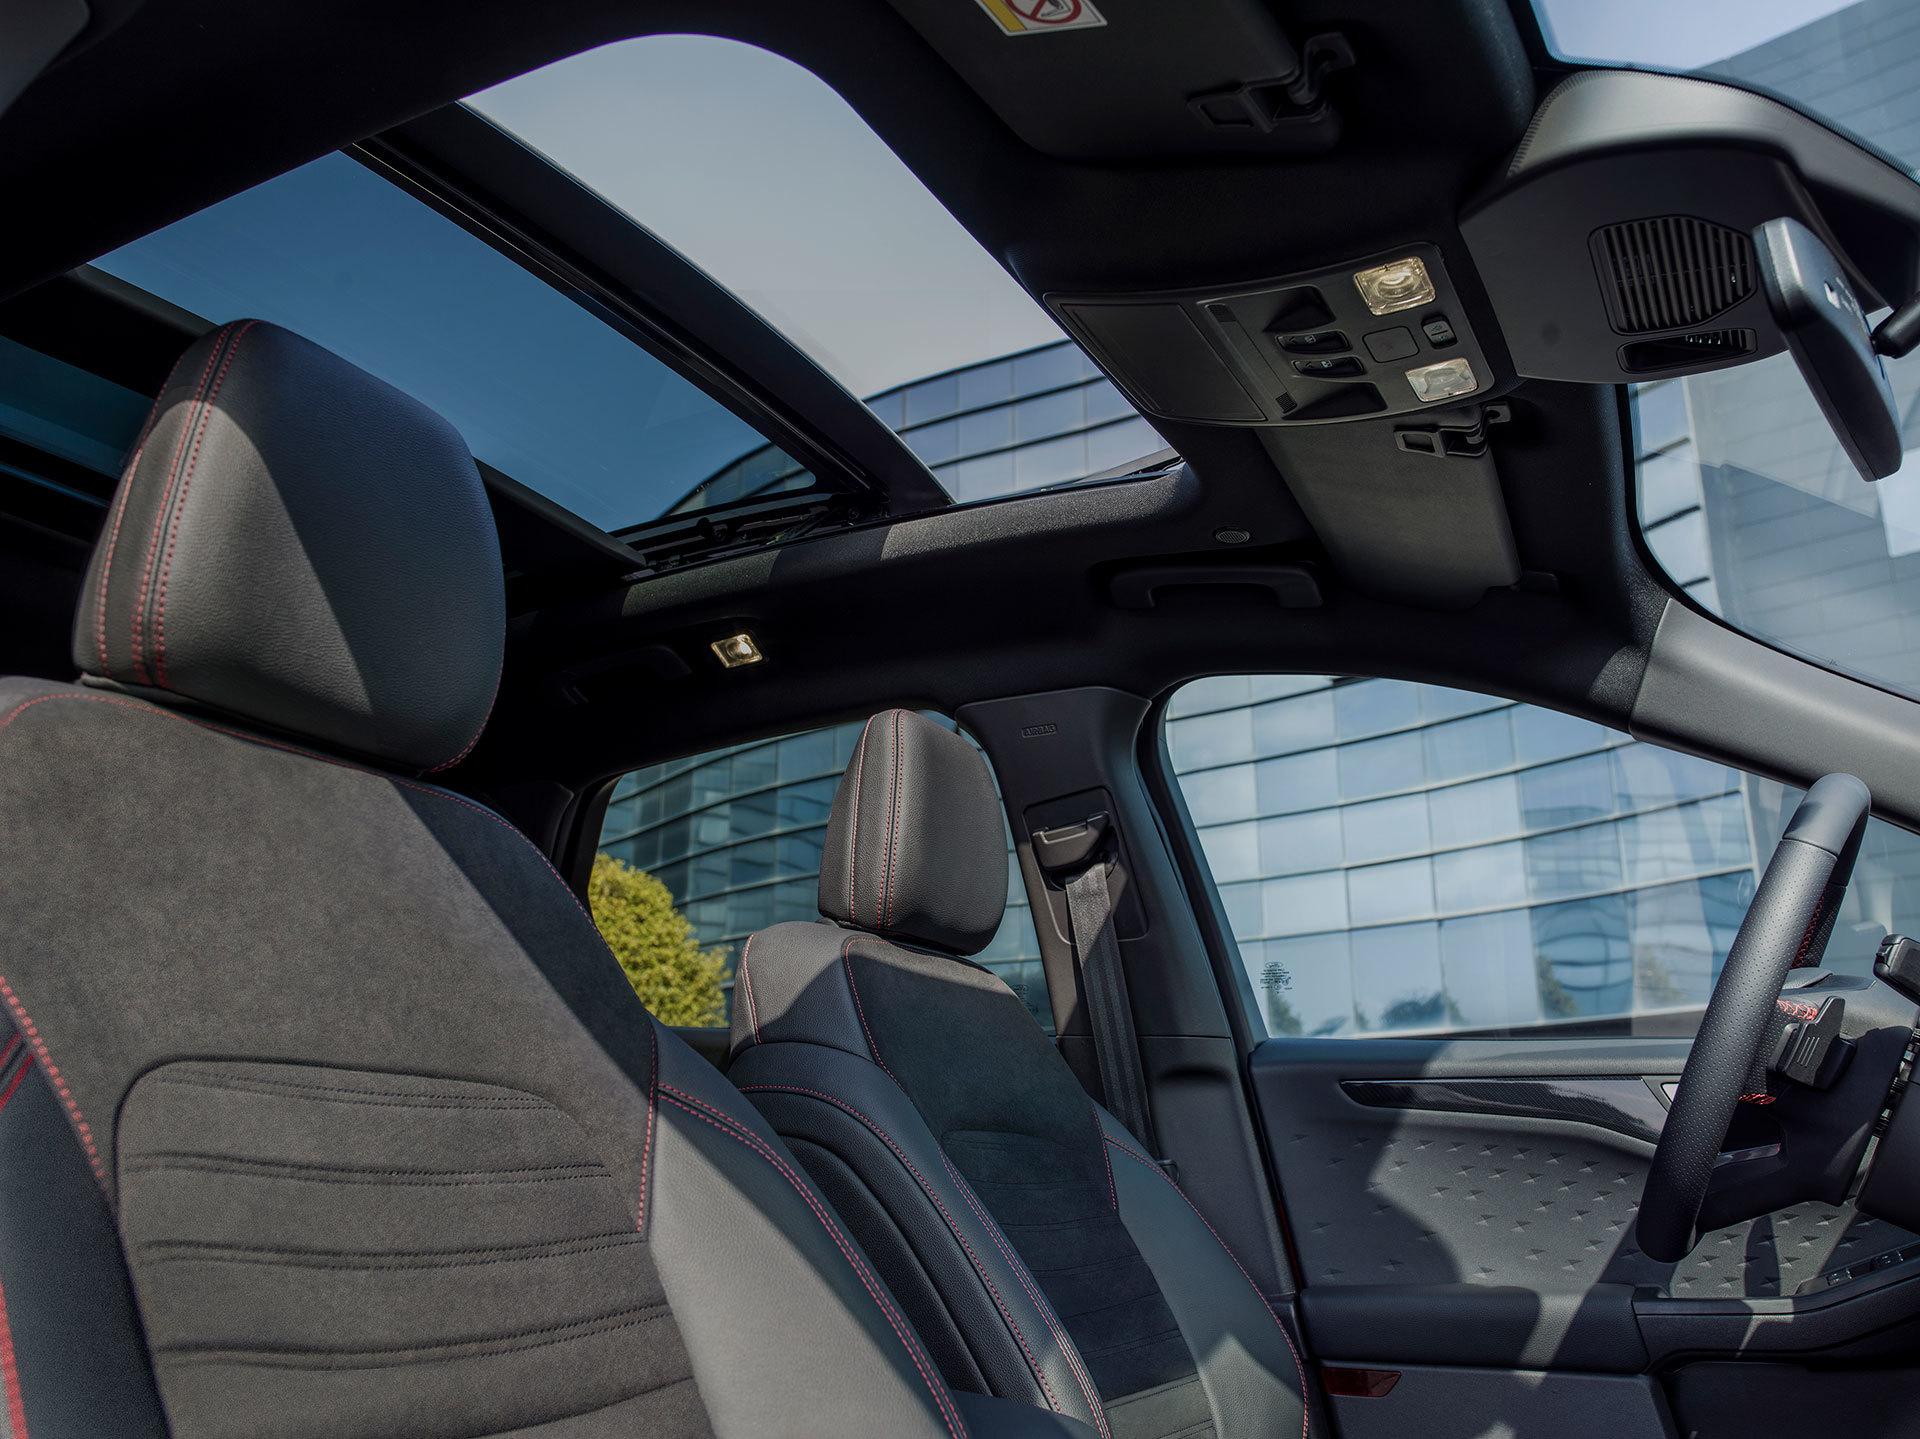 Ford Kuga Techo Panoramico